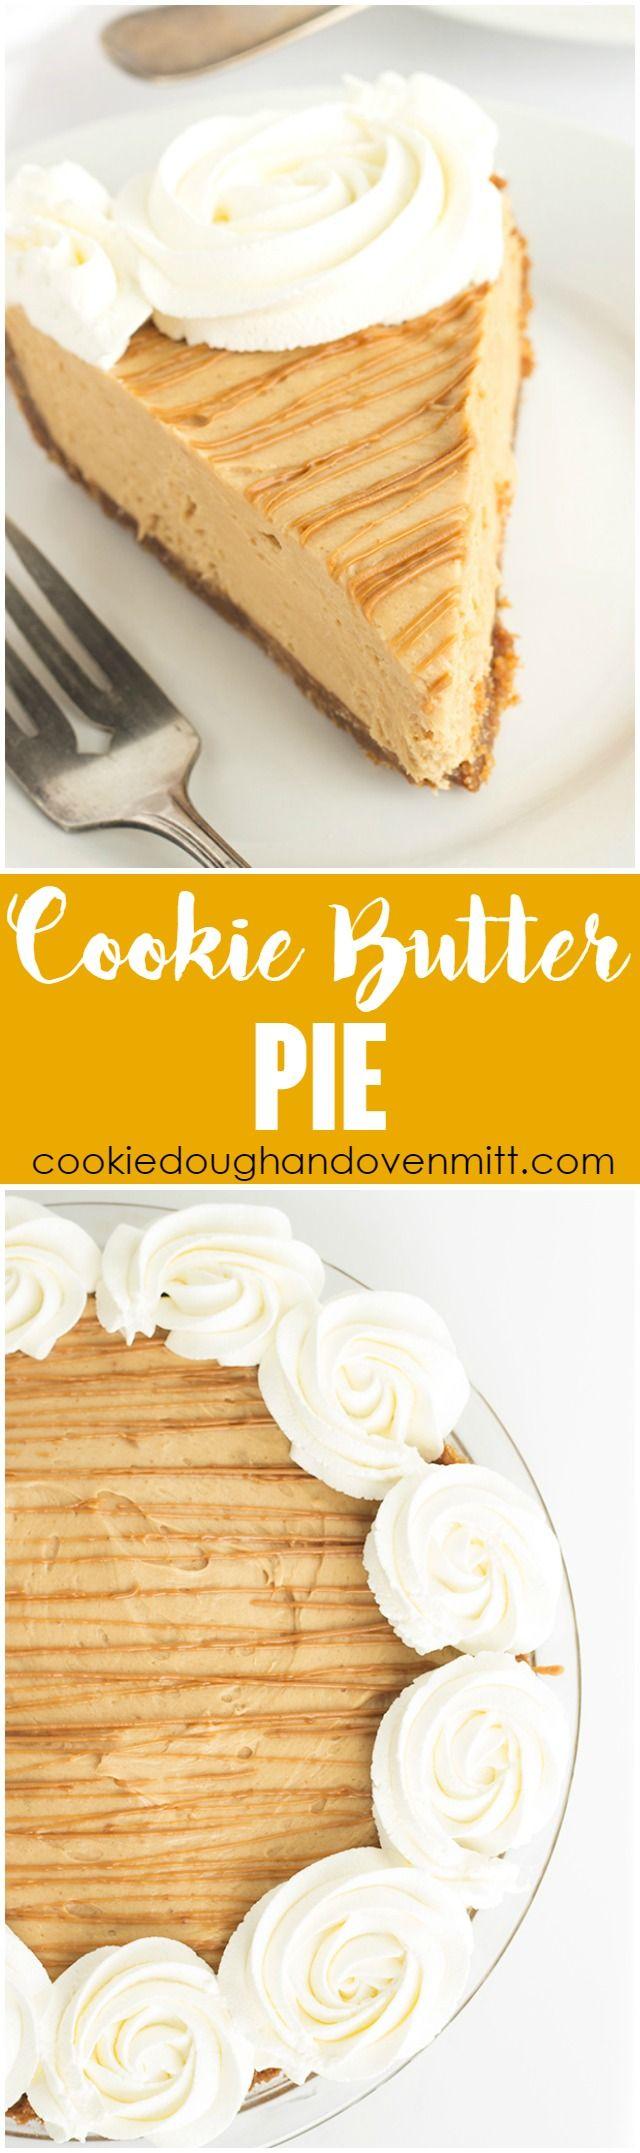 Cookie Butter Pie